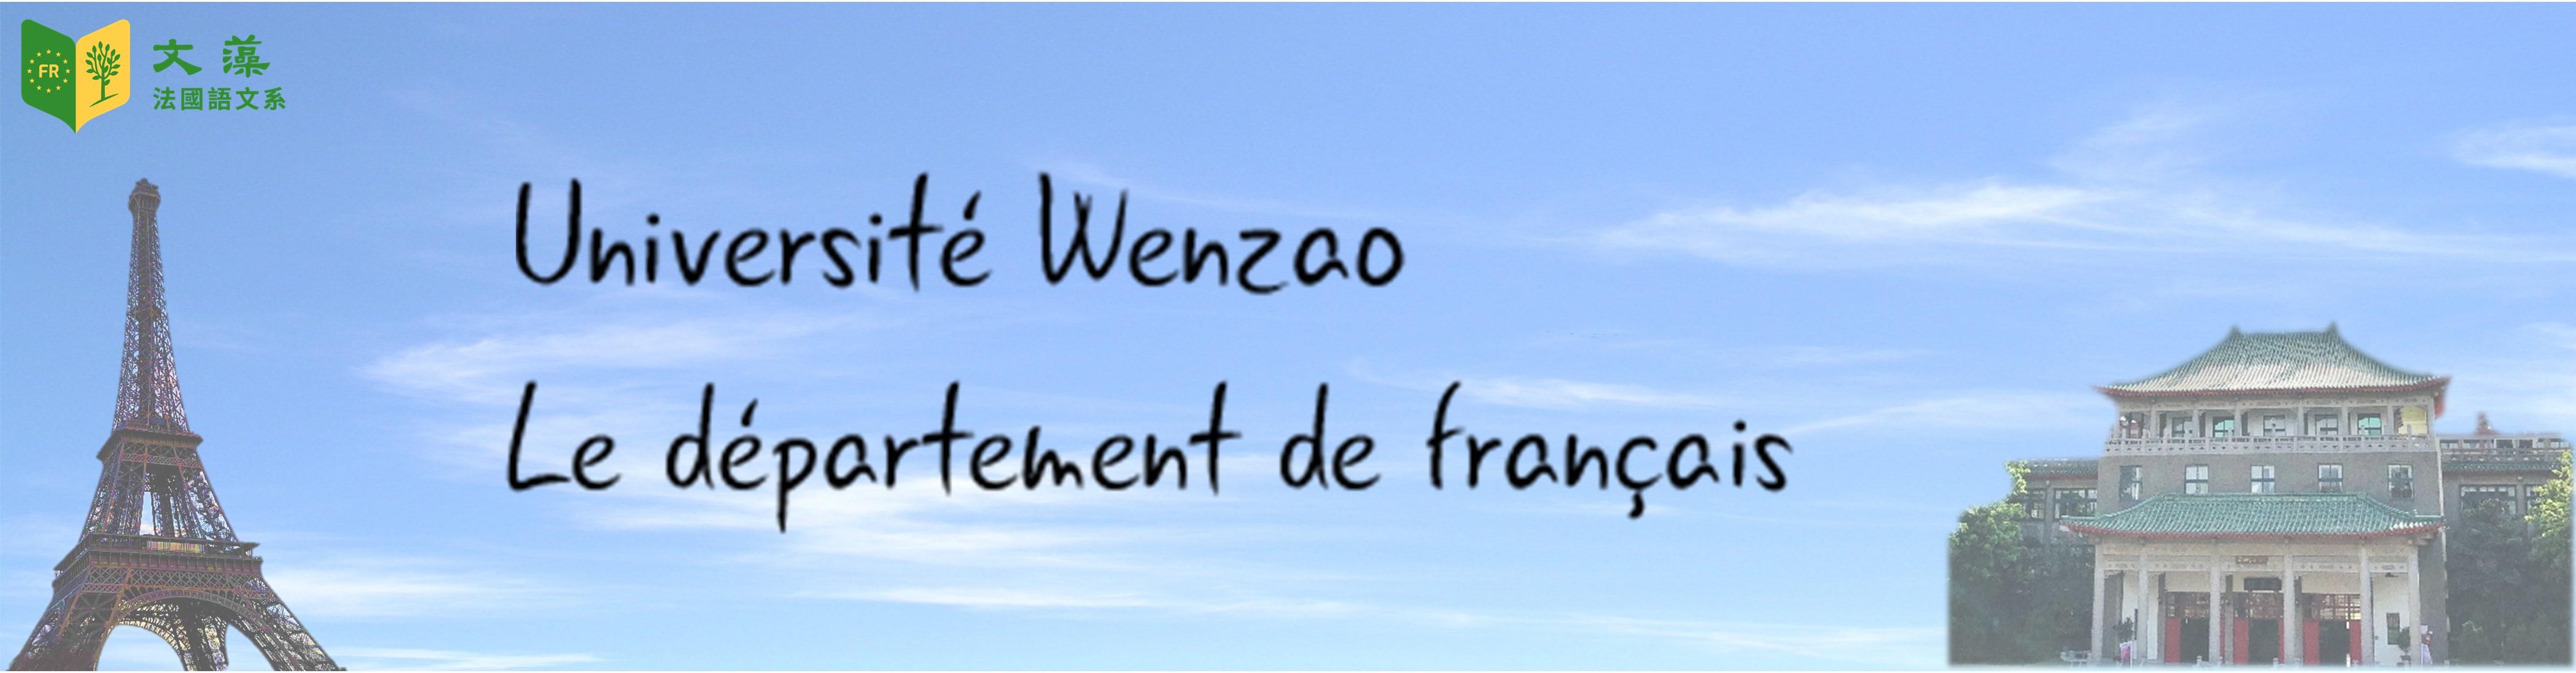 法文系首頁Banner(另開新視窗)